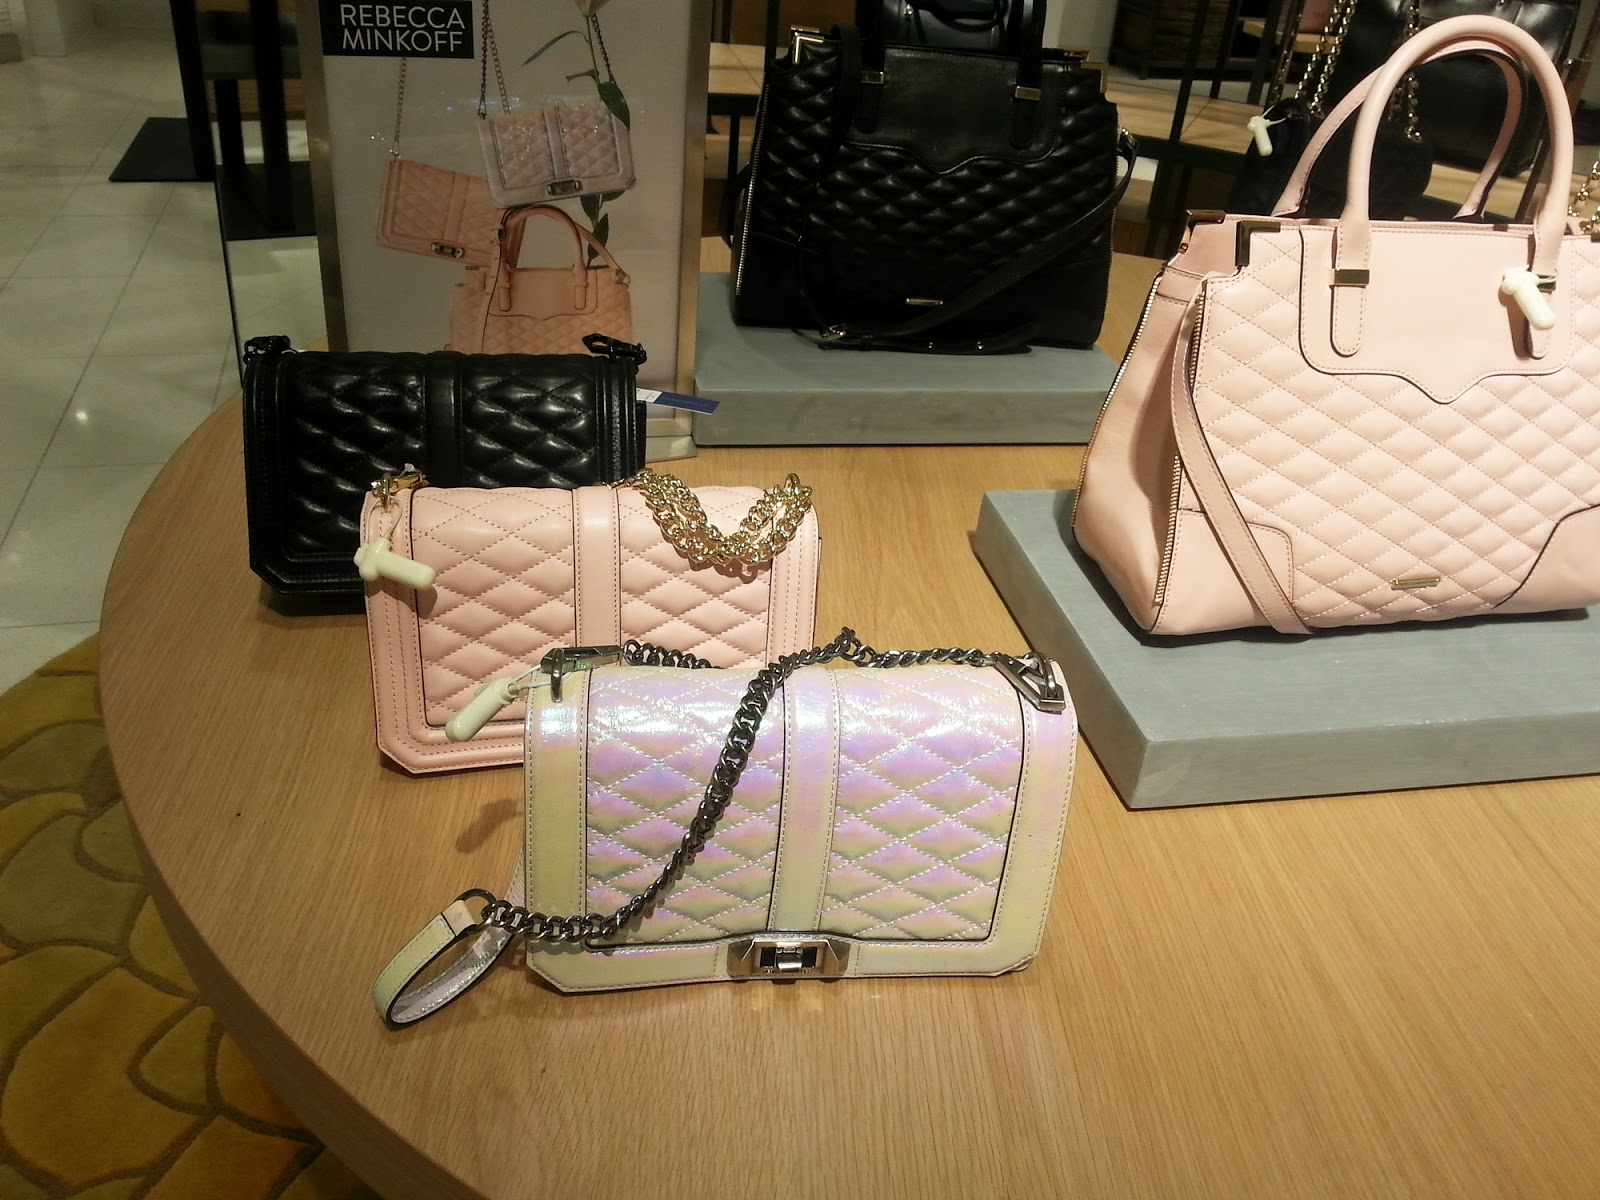 Rebecca Minkoff Love bags in black, pink, and opal.